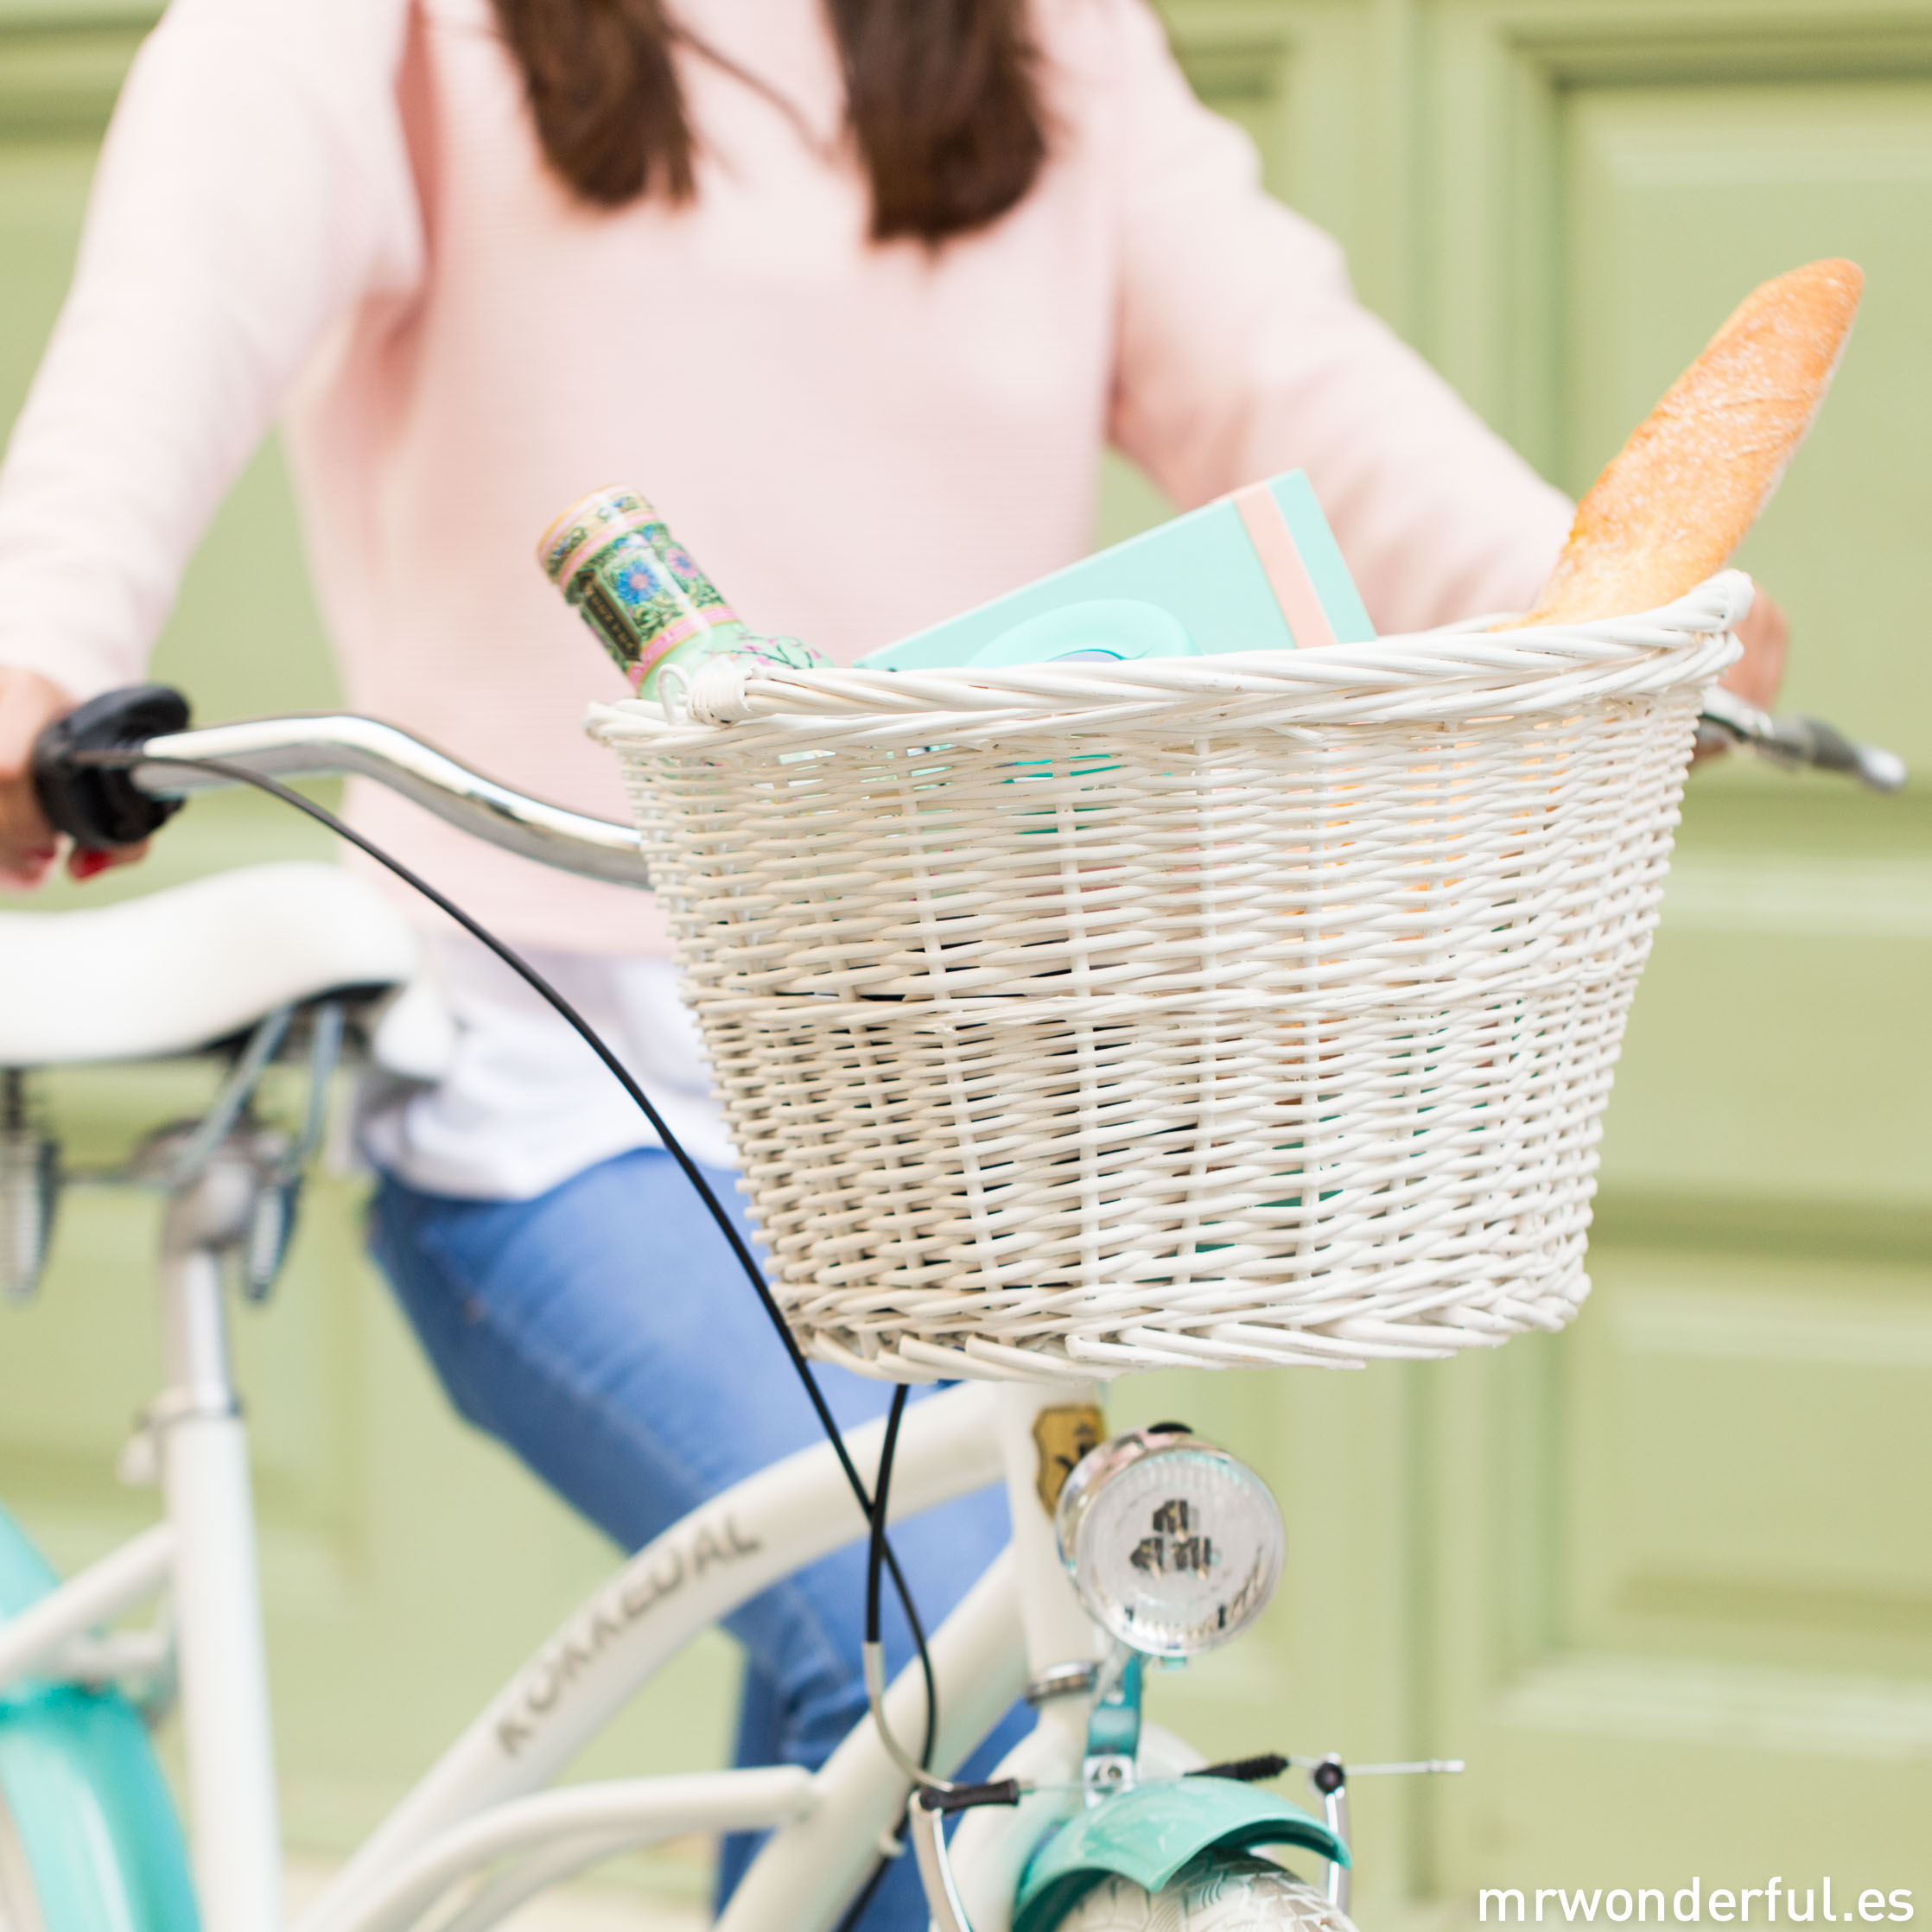 mrwonderful_concurso-bicicleta-31